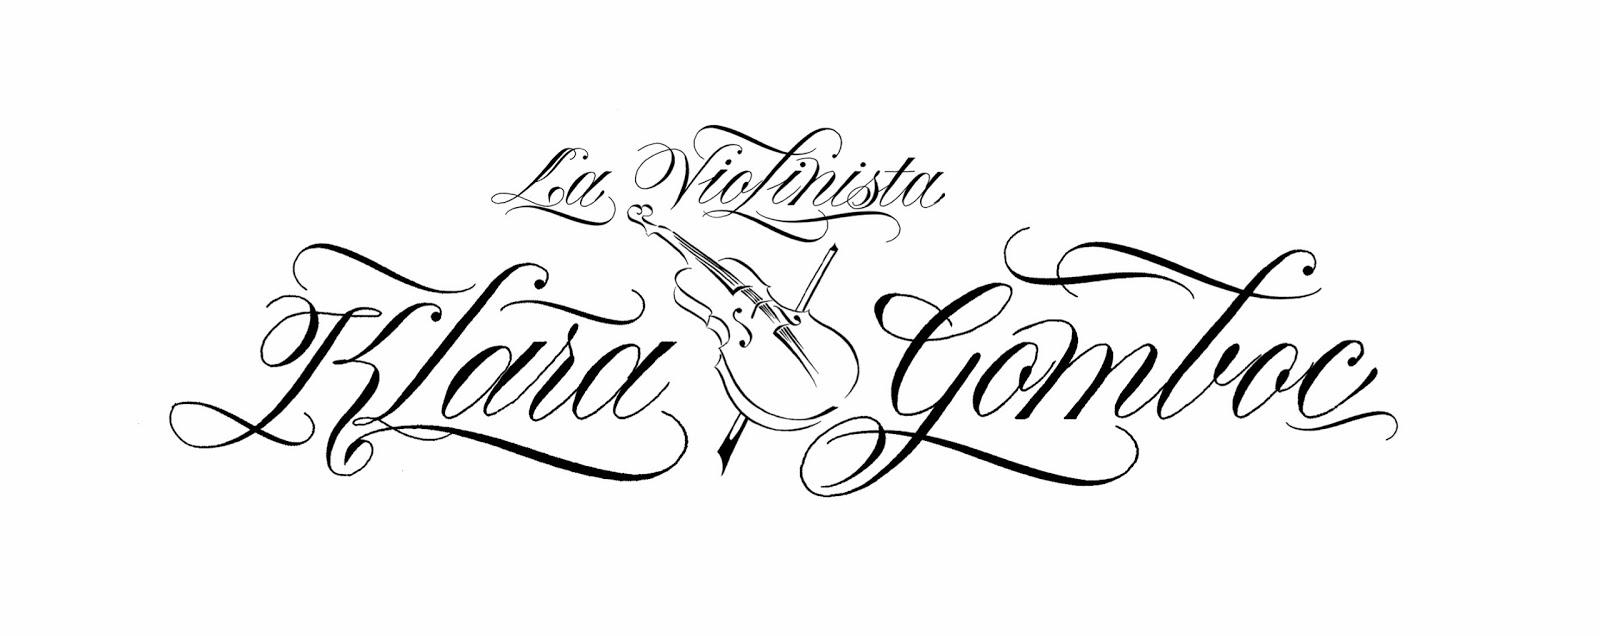 Calligraphy by loredana zega logo tattoo Calligraphy logo